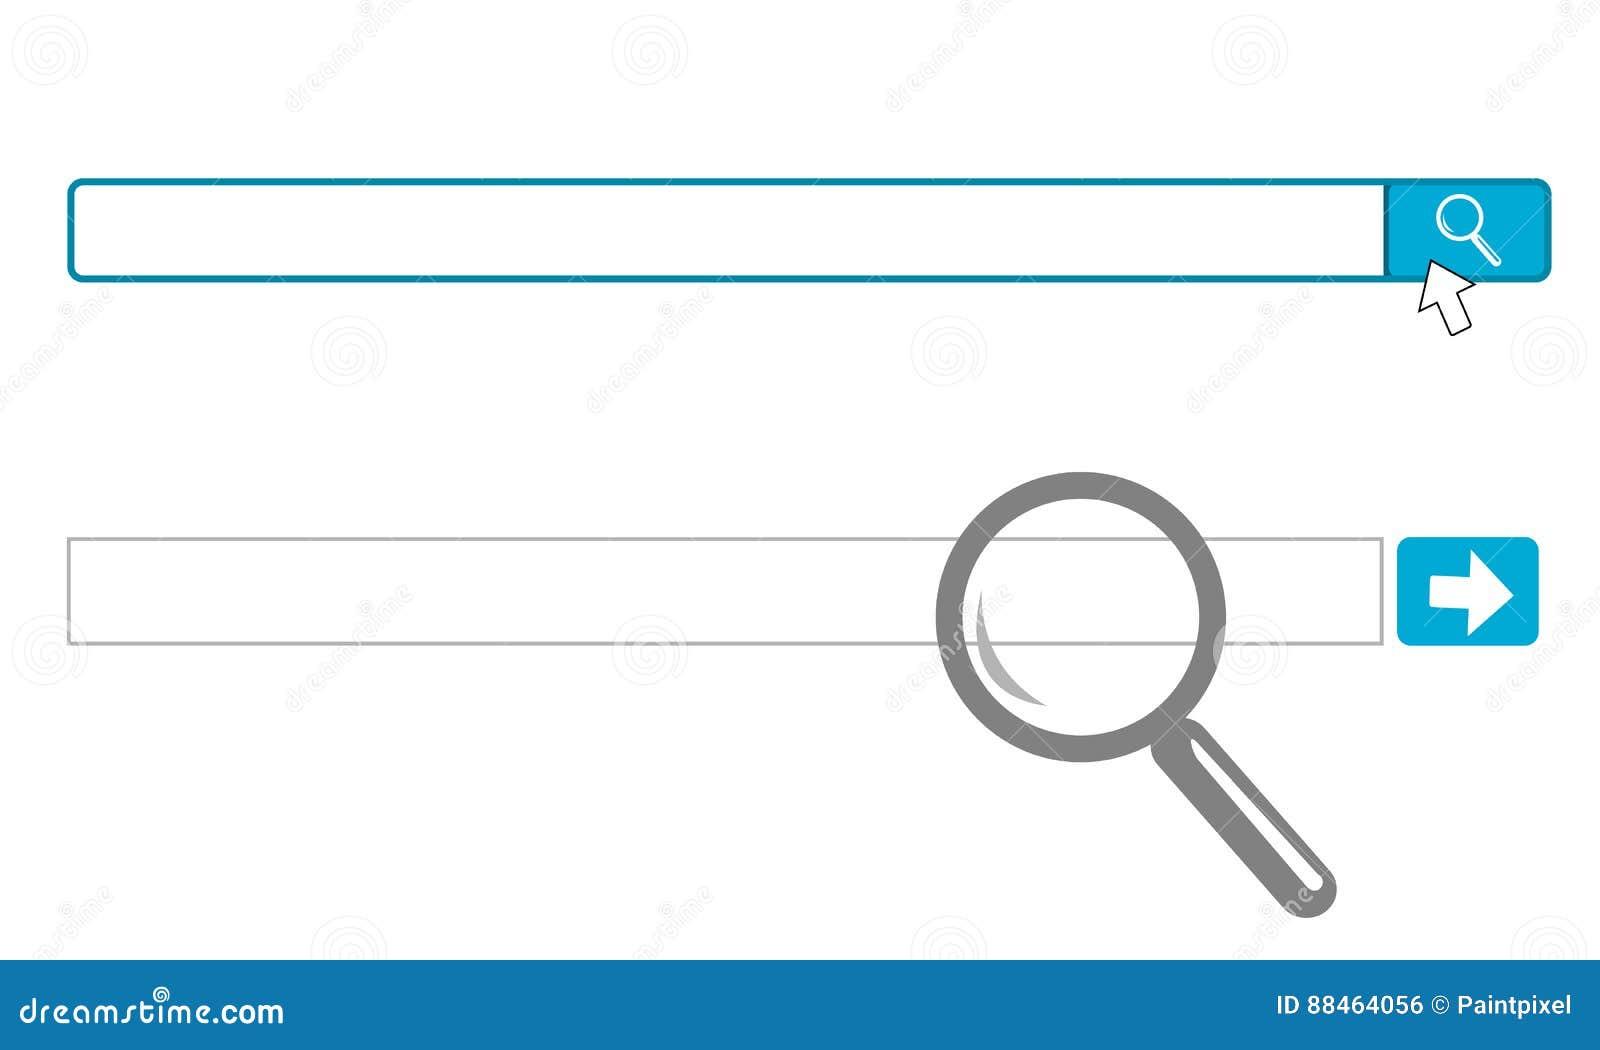 internet search engine input box stock illustration illustration